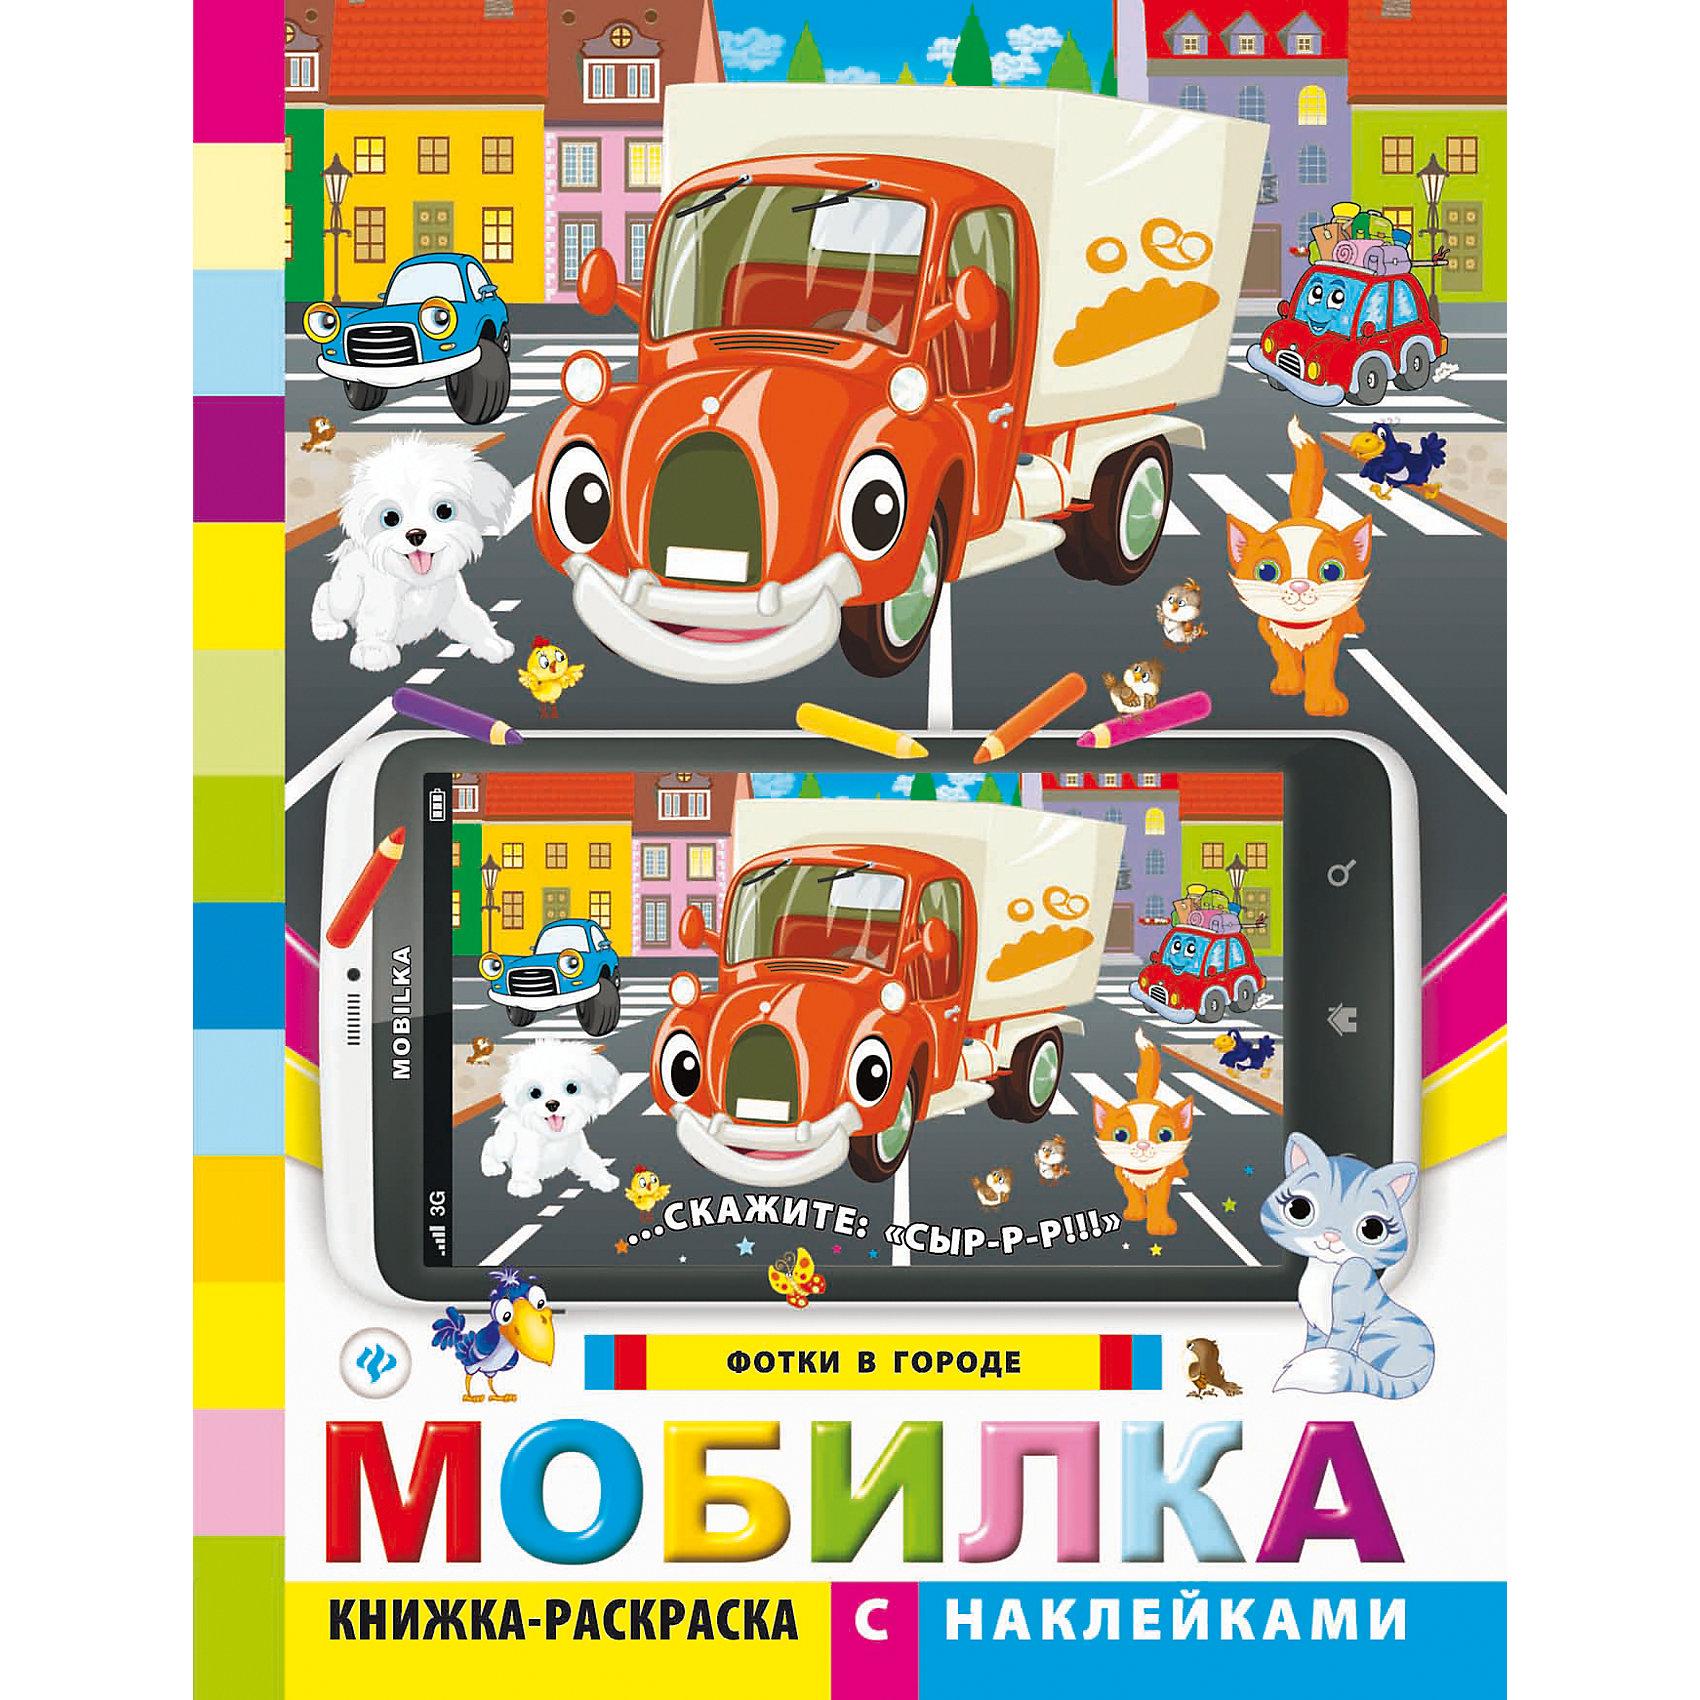 Fenix Книжка-расскраска с наклейками Фотки в городе сызранова в ред мишкина книжка раскраска с наклейками